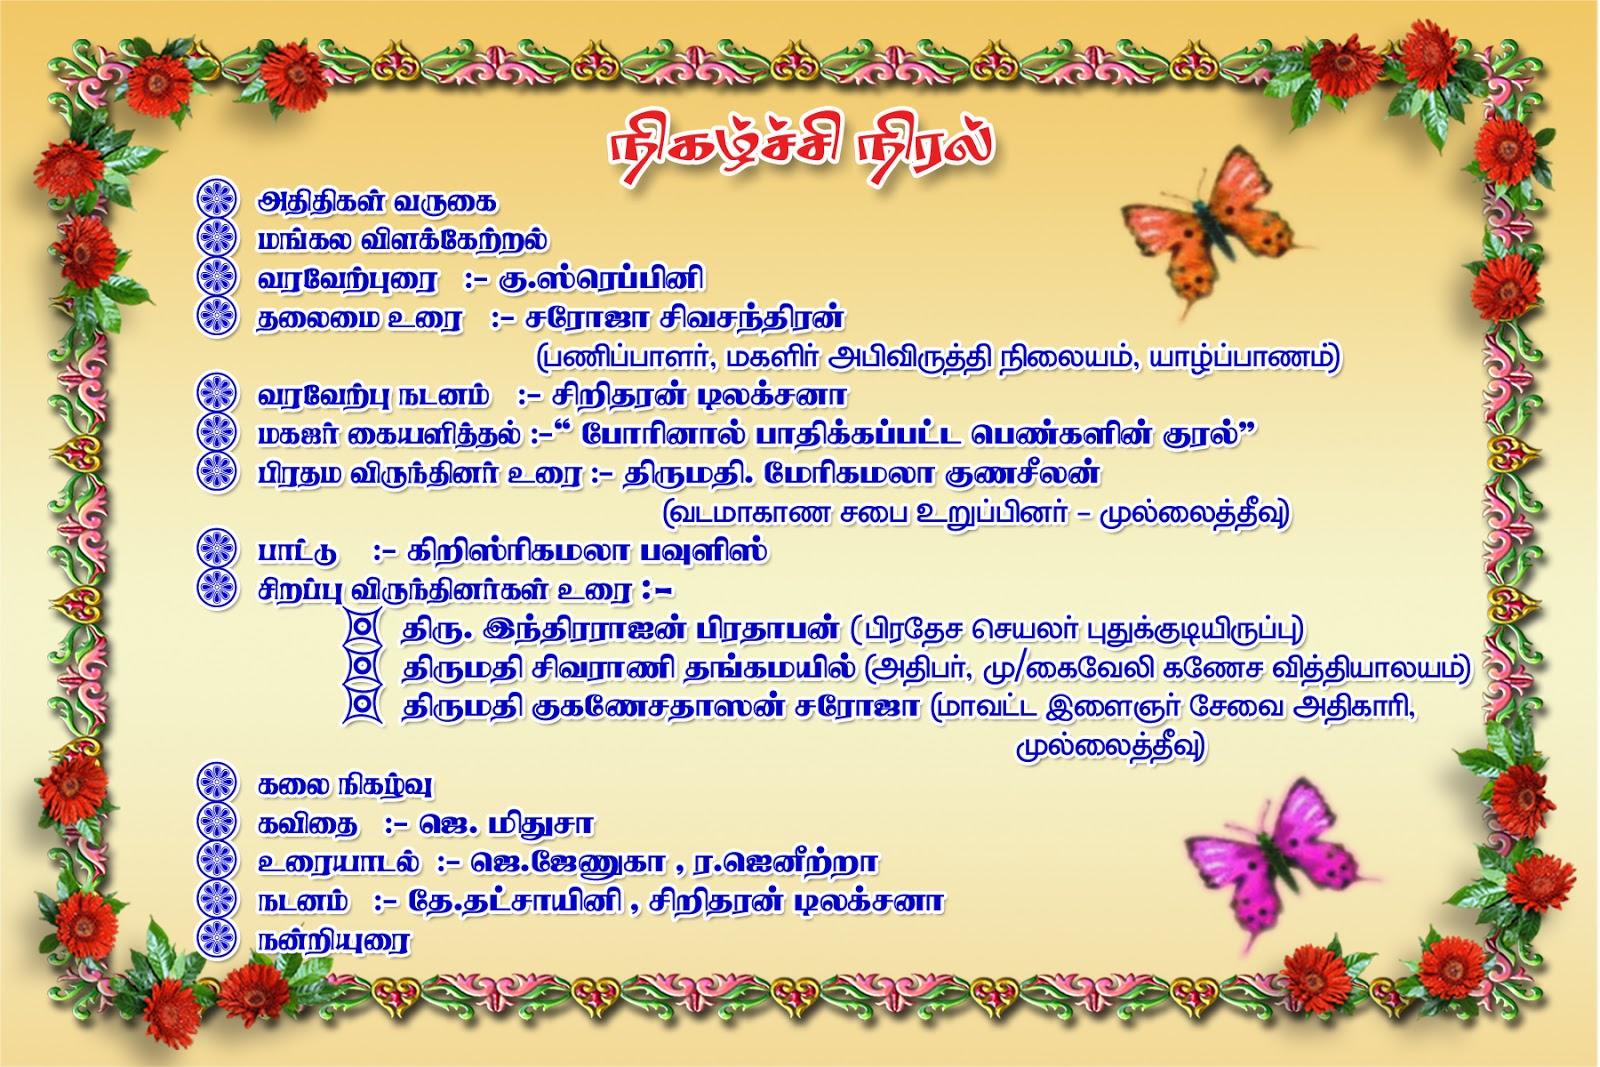 International Women S Day 2014 Invitation Centre For